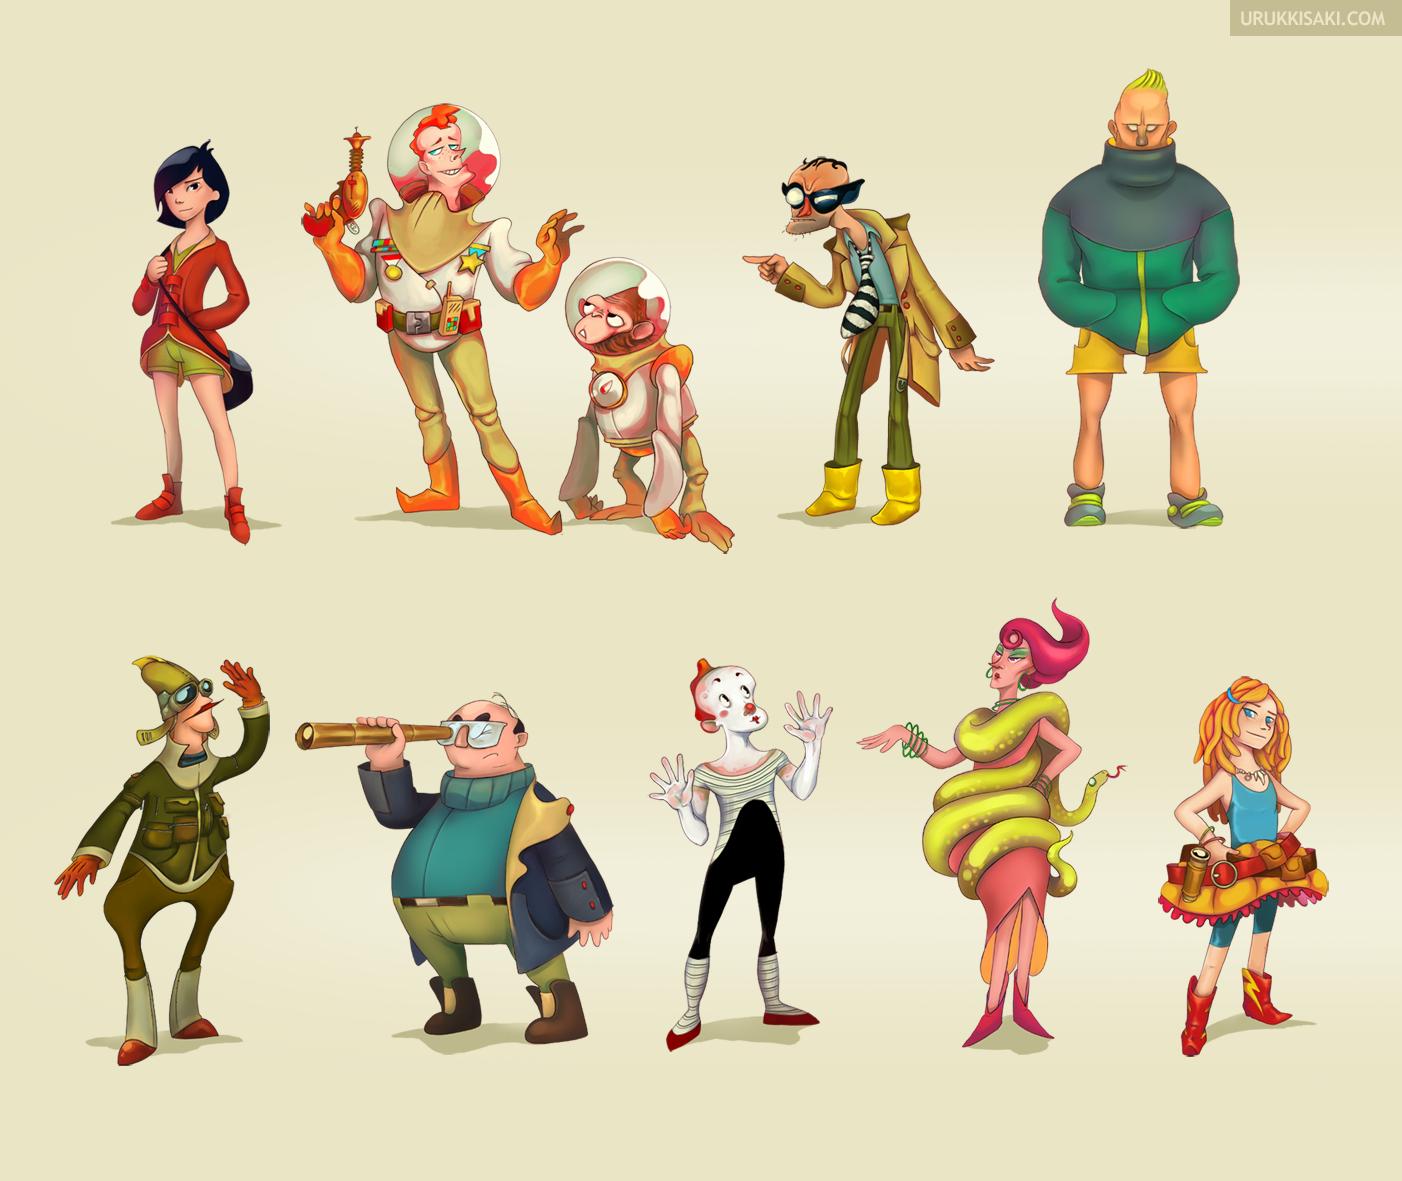 Game Character Design Contest 2015 : Character design vol i by urukkisaki on deviantart